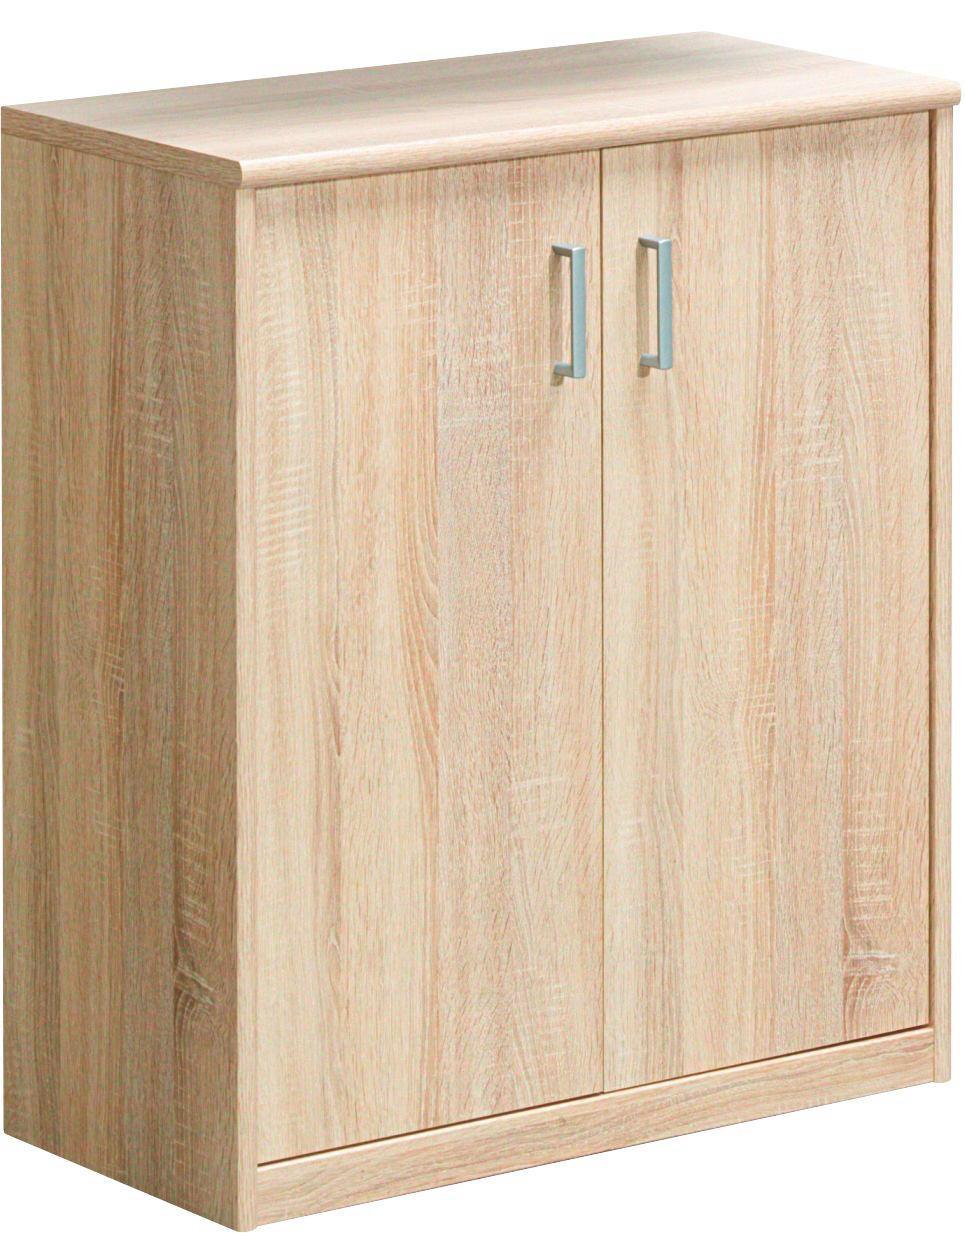 KOMODA - boje hrasta/boje srebra, Konvencionalno, drvni materijal/plastika (72/84/36cm) - CS SCHMAL